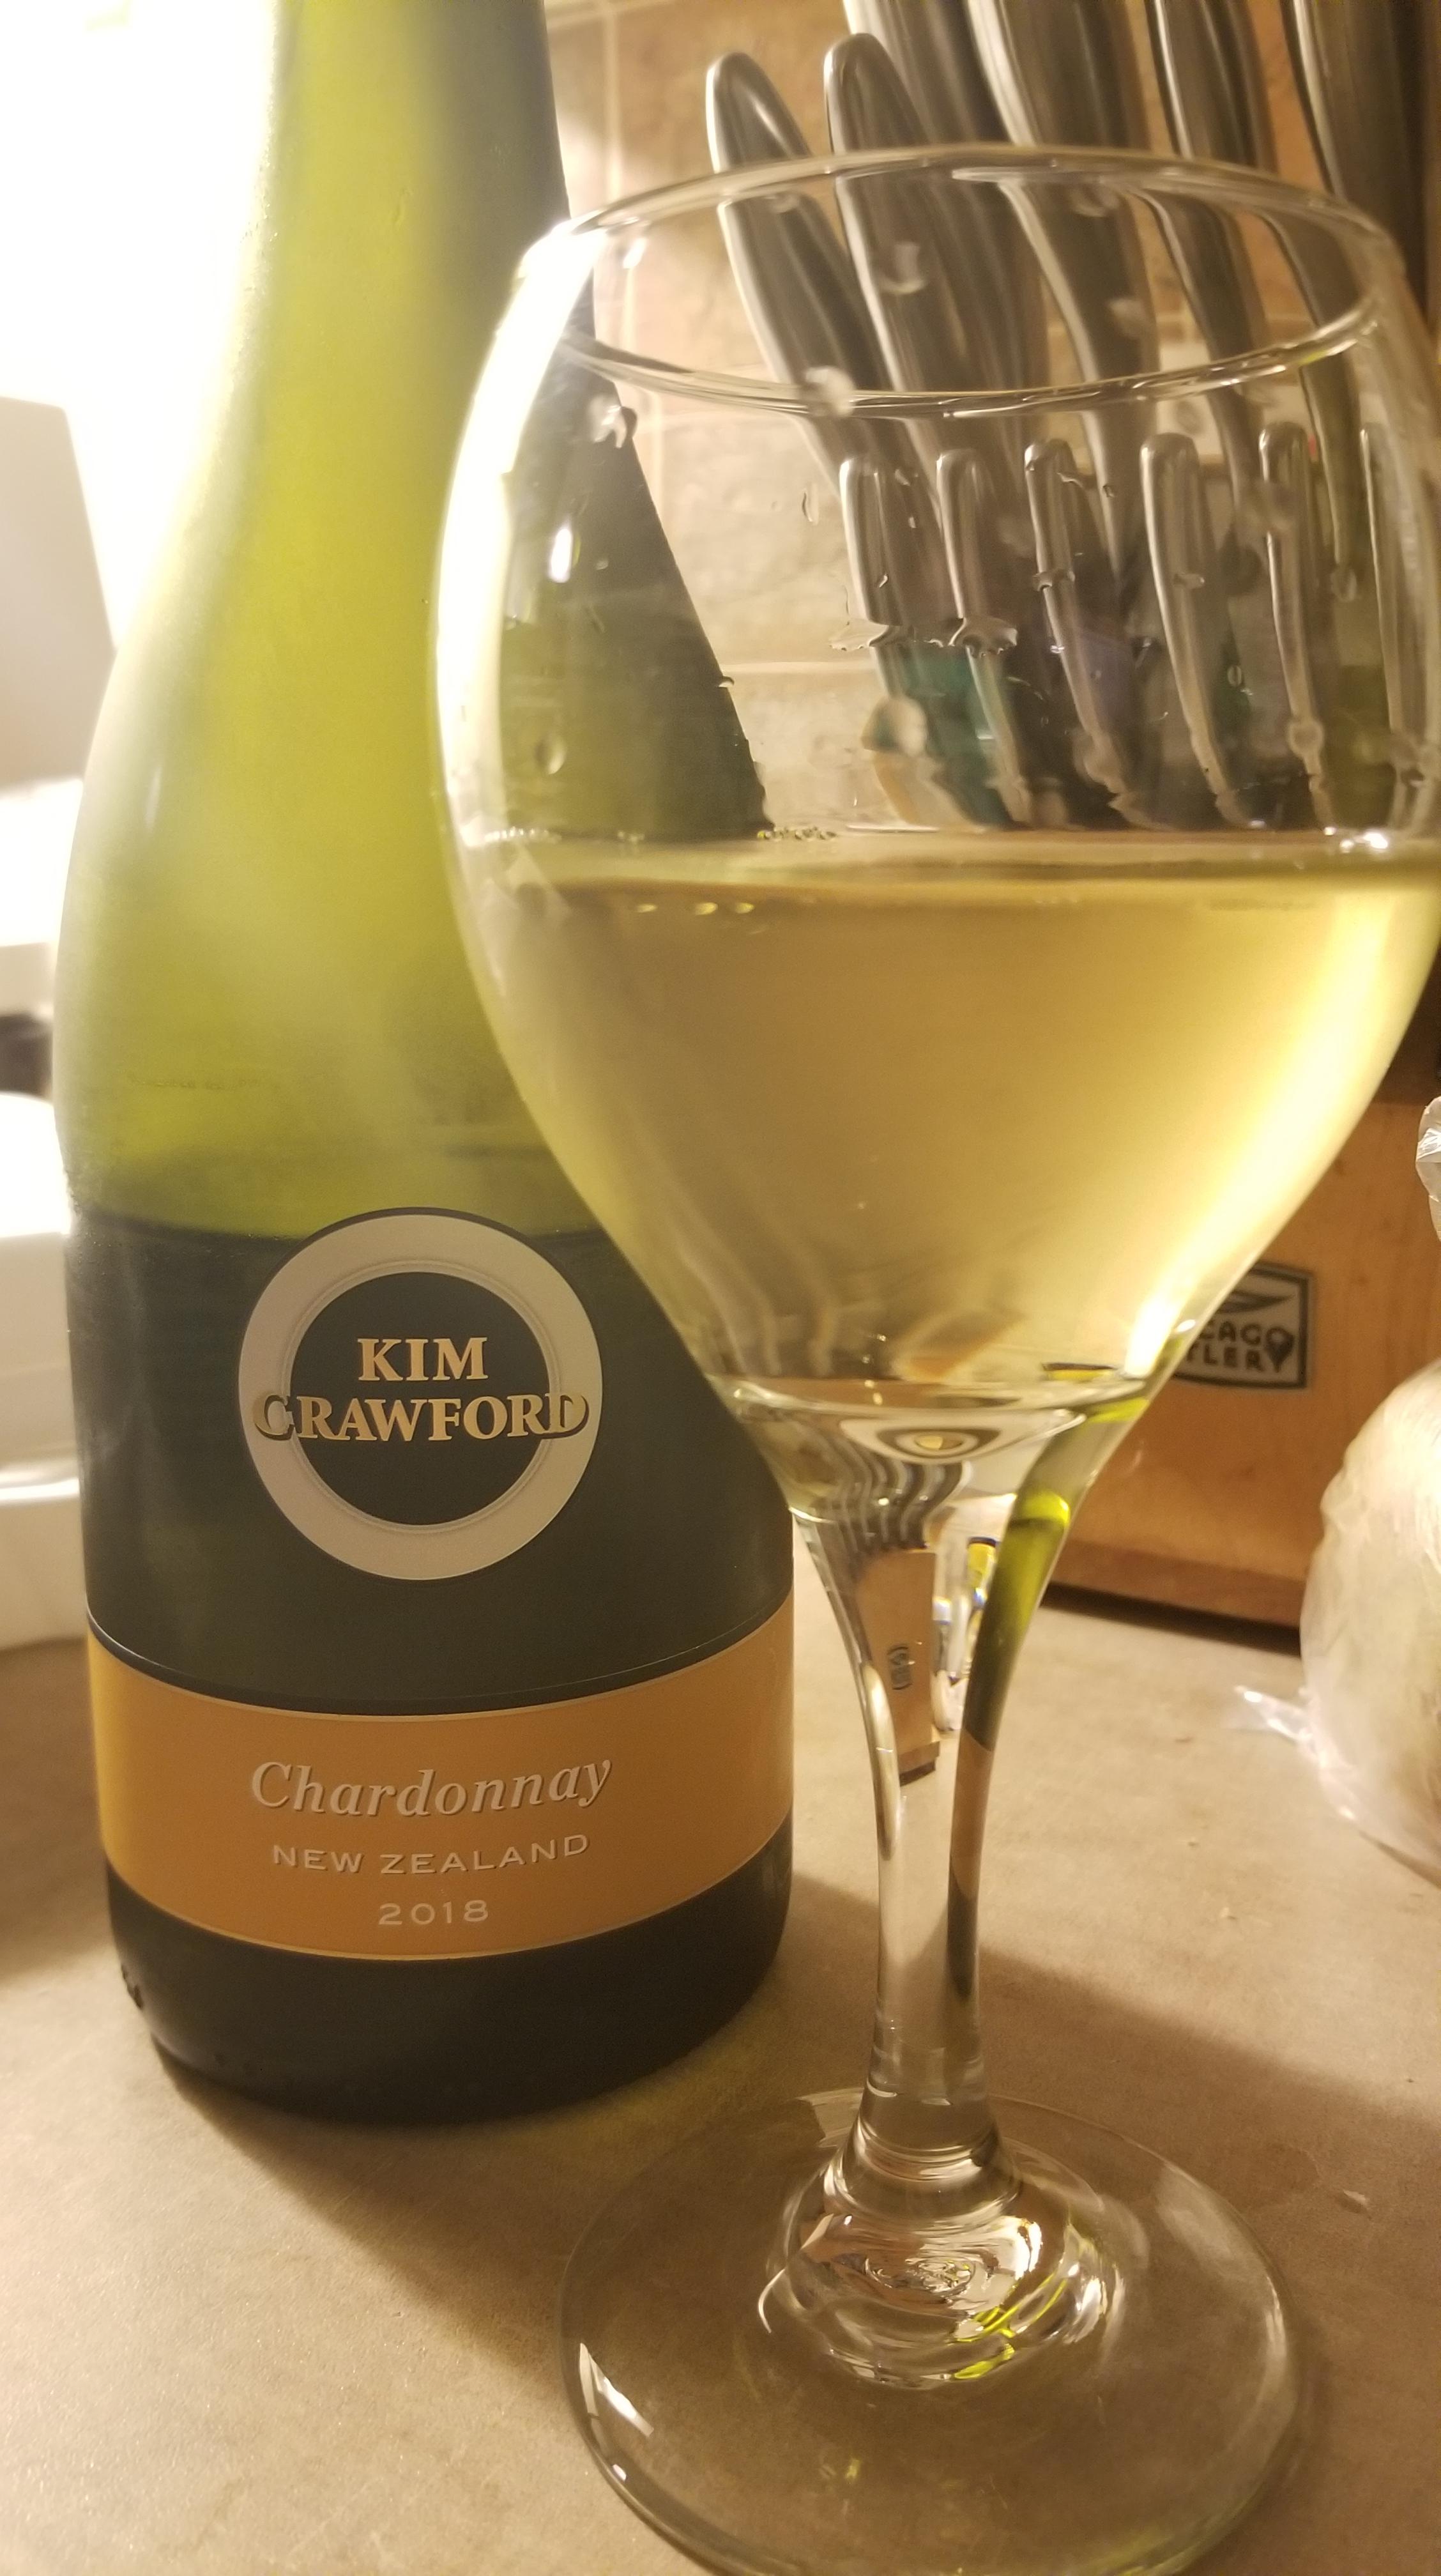 Kim Crawford Chardonnay 2018